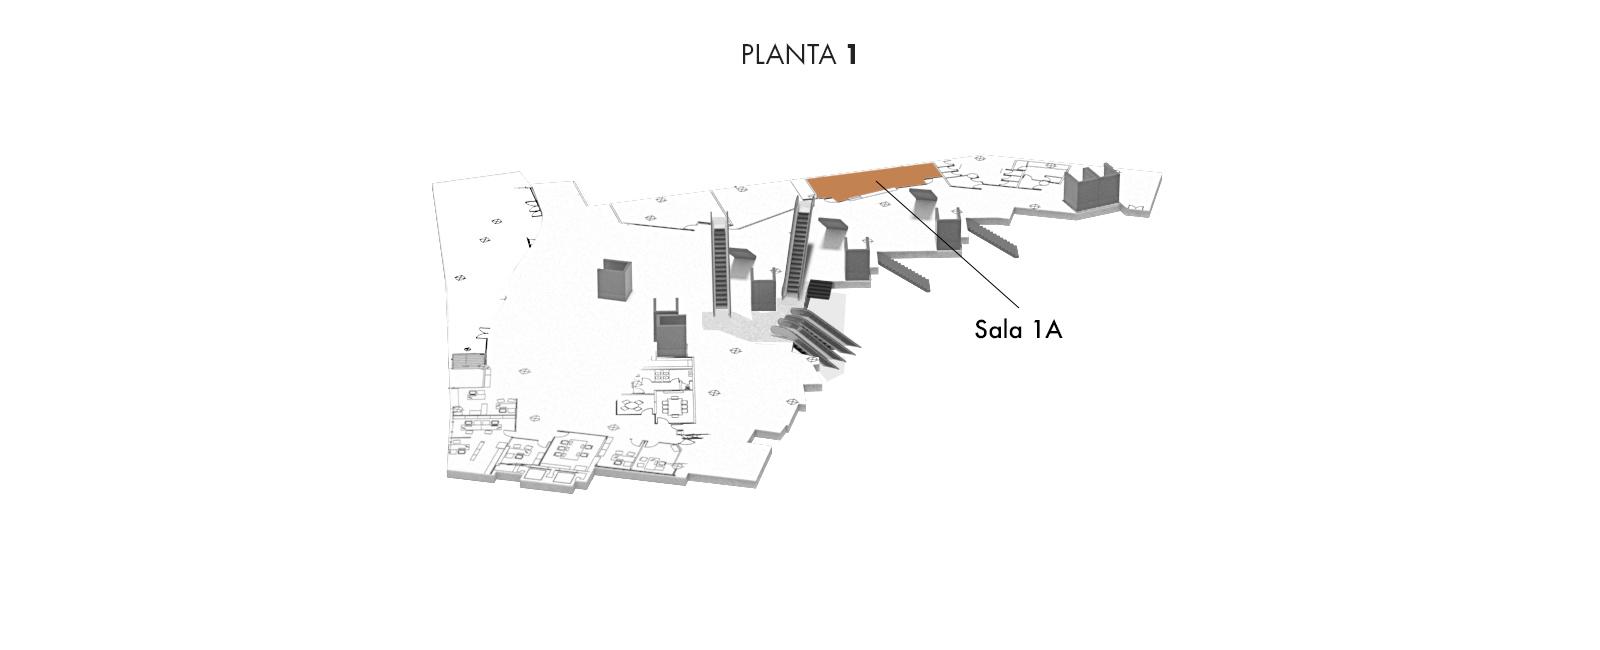 Sala 1A, Planta 1 | Palacio Euskalduna Jauregia